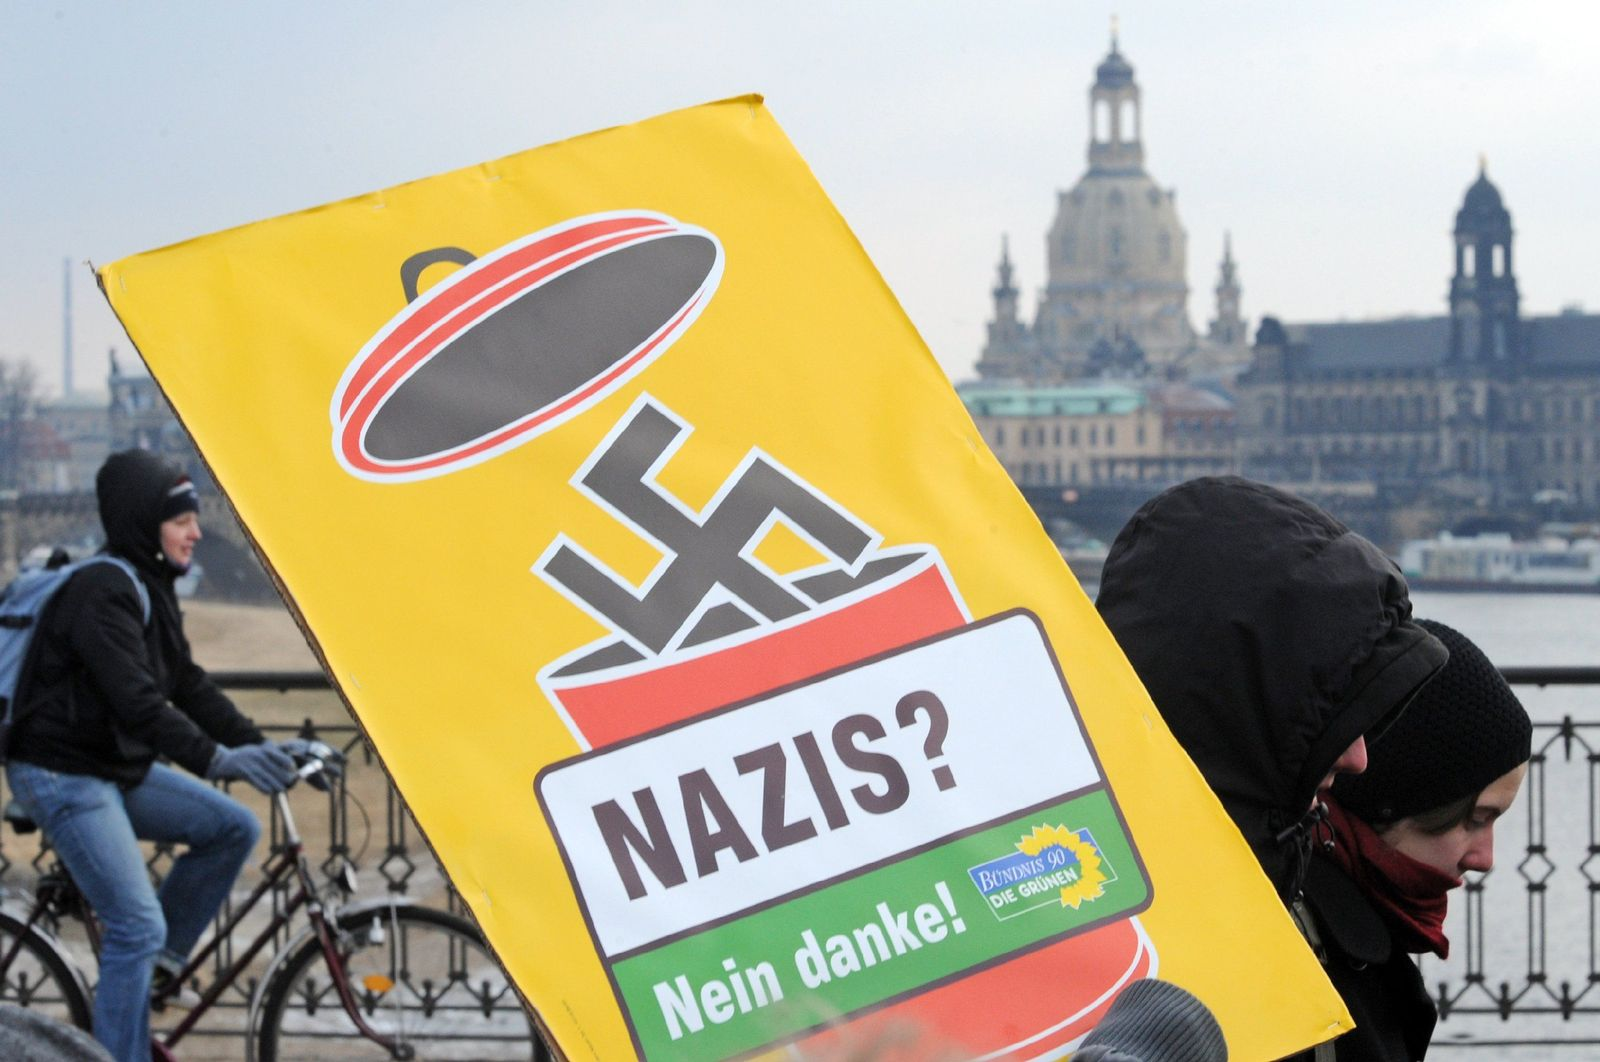 anti-nazi-demo in dreseden